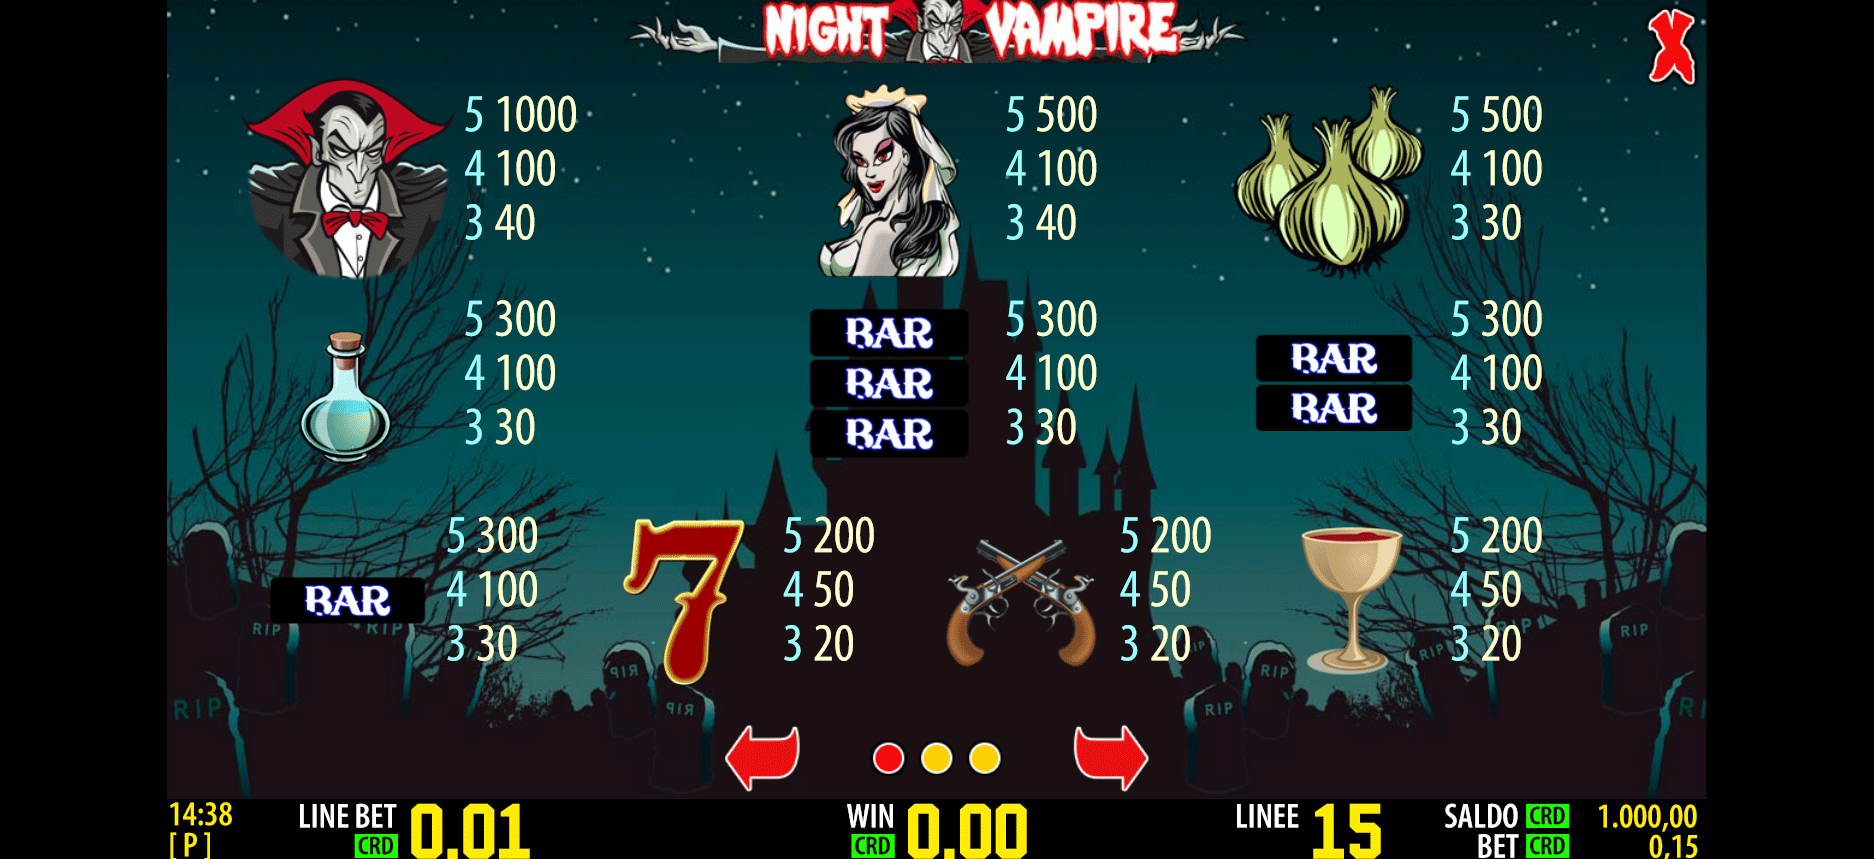 paytable della slot online night vampire hd